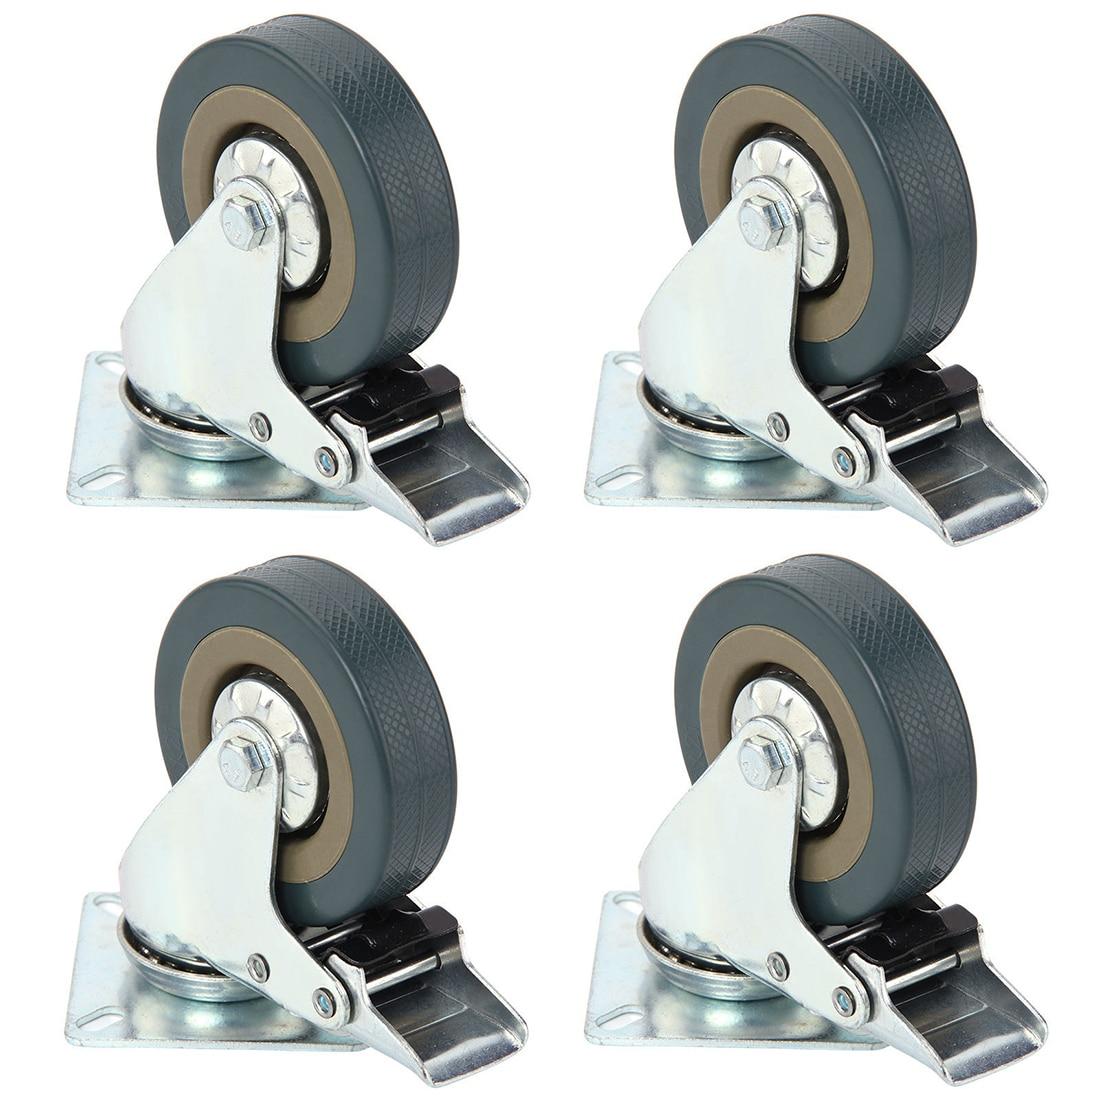 Juego de ruedas giratorias de goma de 50x17mm de gran resistencia para ruedas de ruedas 40 kgmodelo: 4 con freno